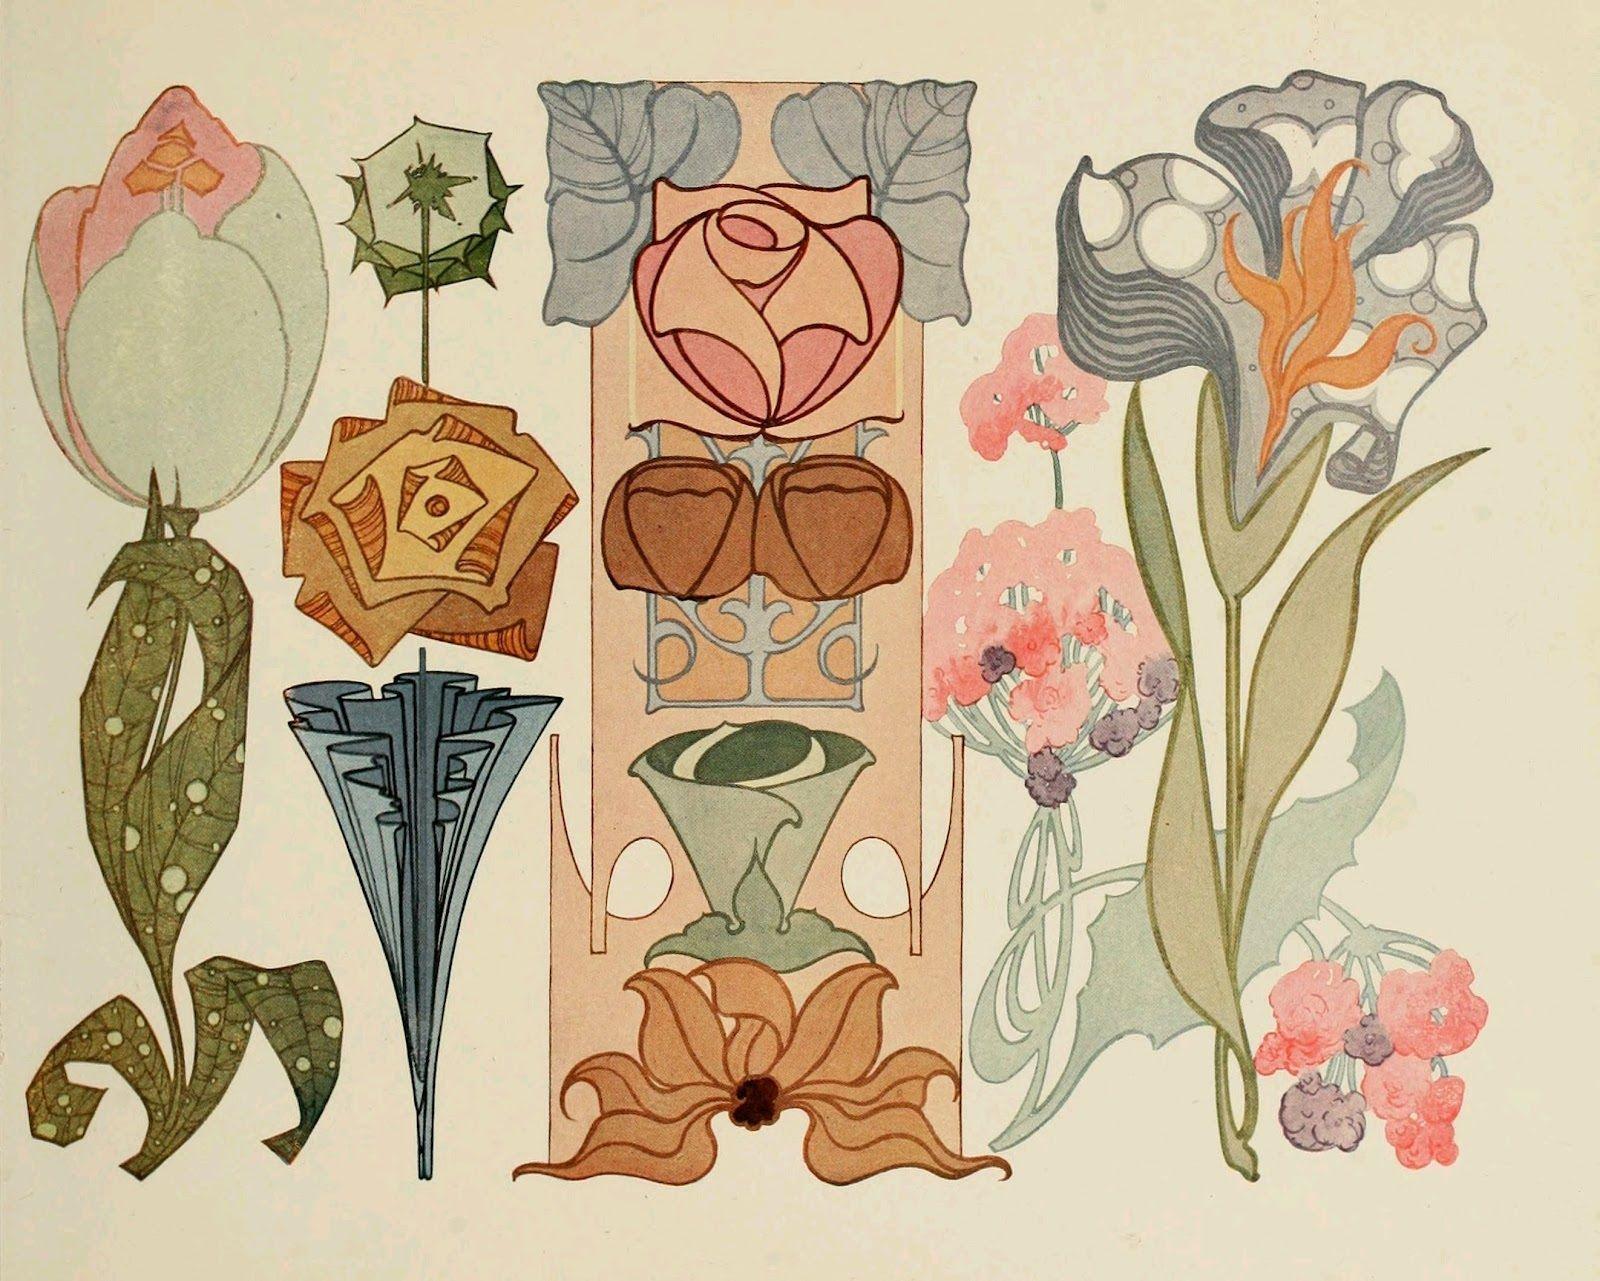 Art nouveau flowers @ http://3.bp.blogspot.com/-PmXJpaIBsIY/T-mBLvidBnI/AAAAAAAAA7g/3pfOVbSYm8Y/s1600/Image4.jpg